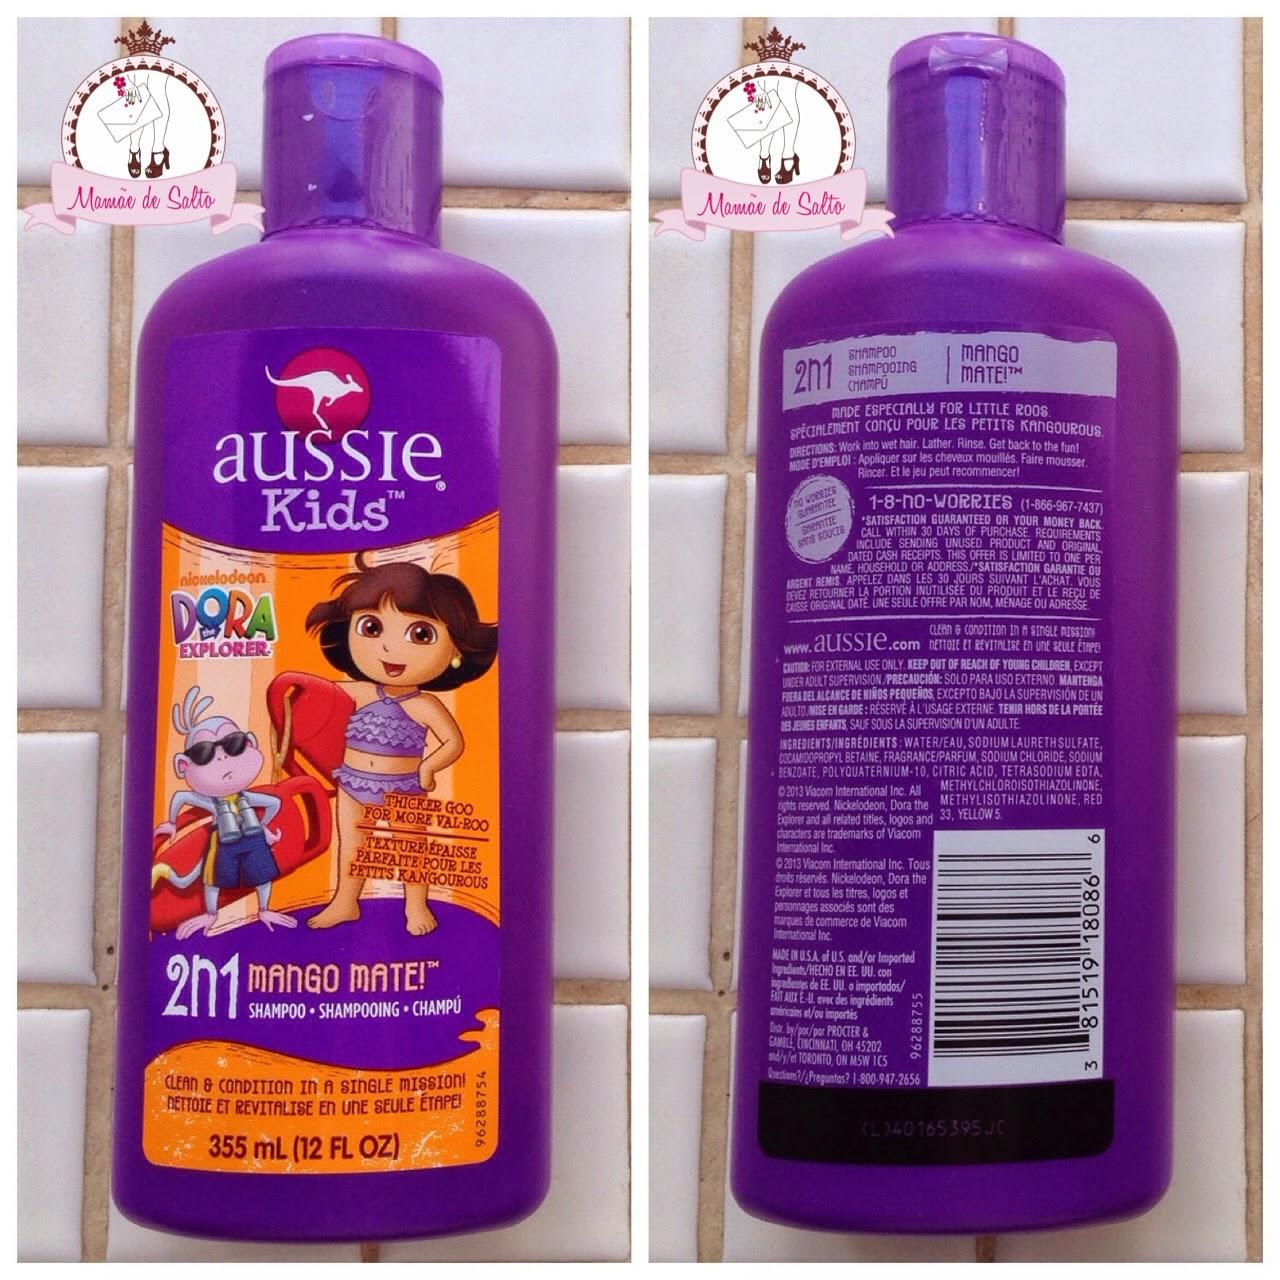 resenha shampoo aussie kids - blog Mamãe de Salto